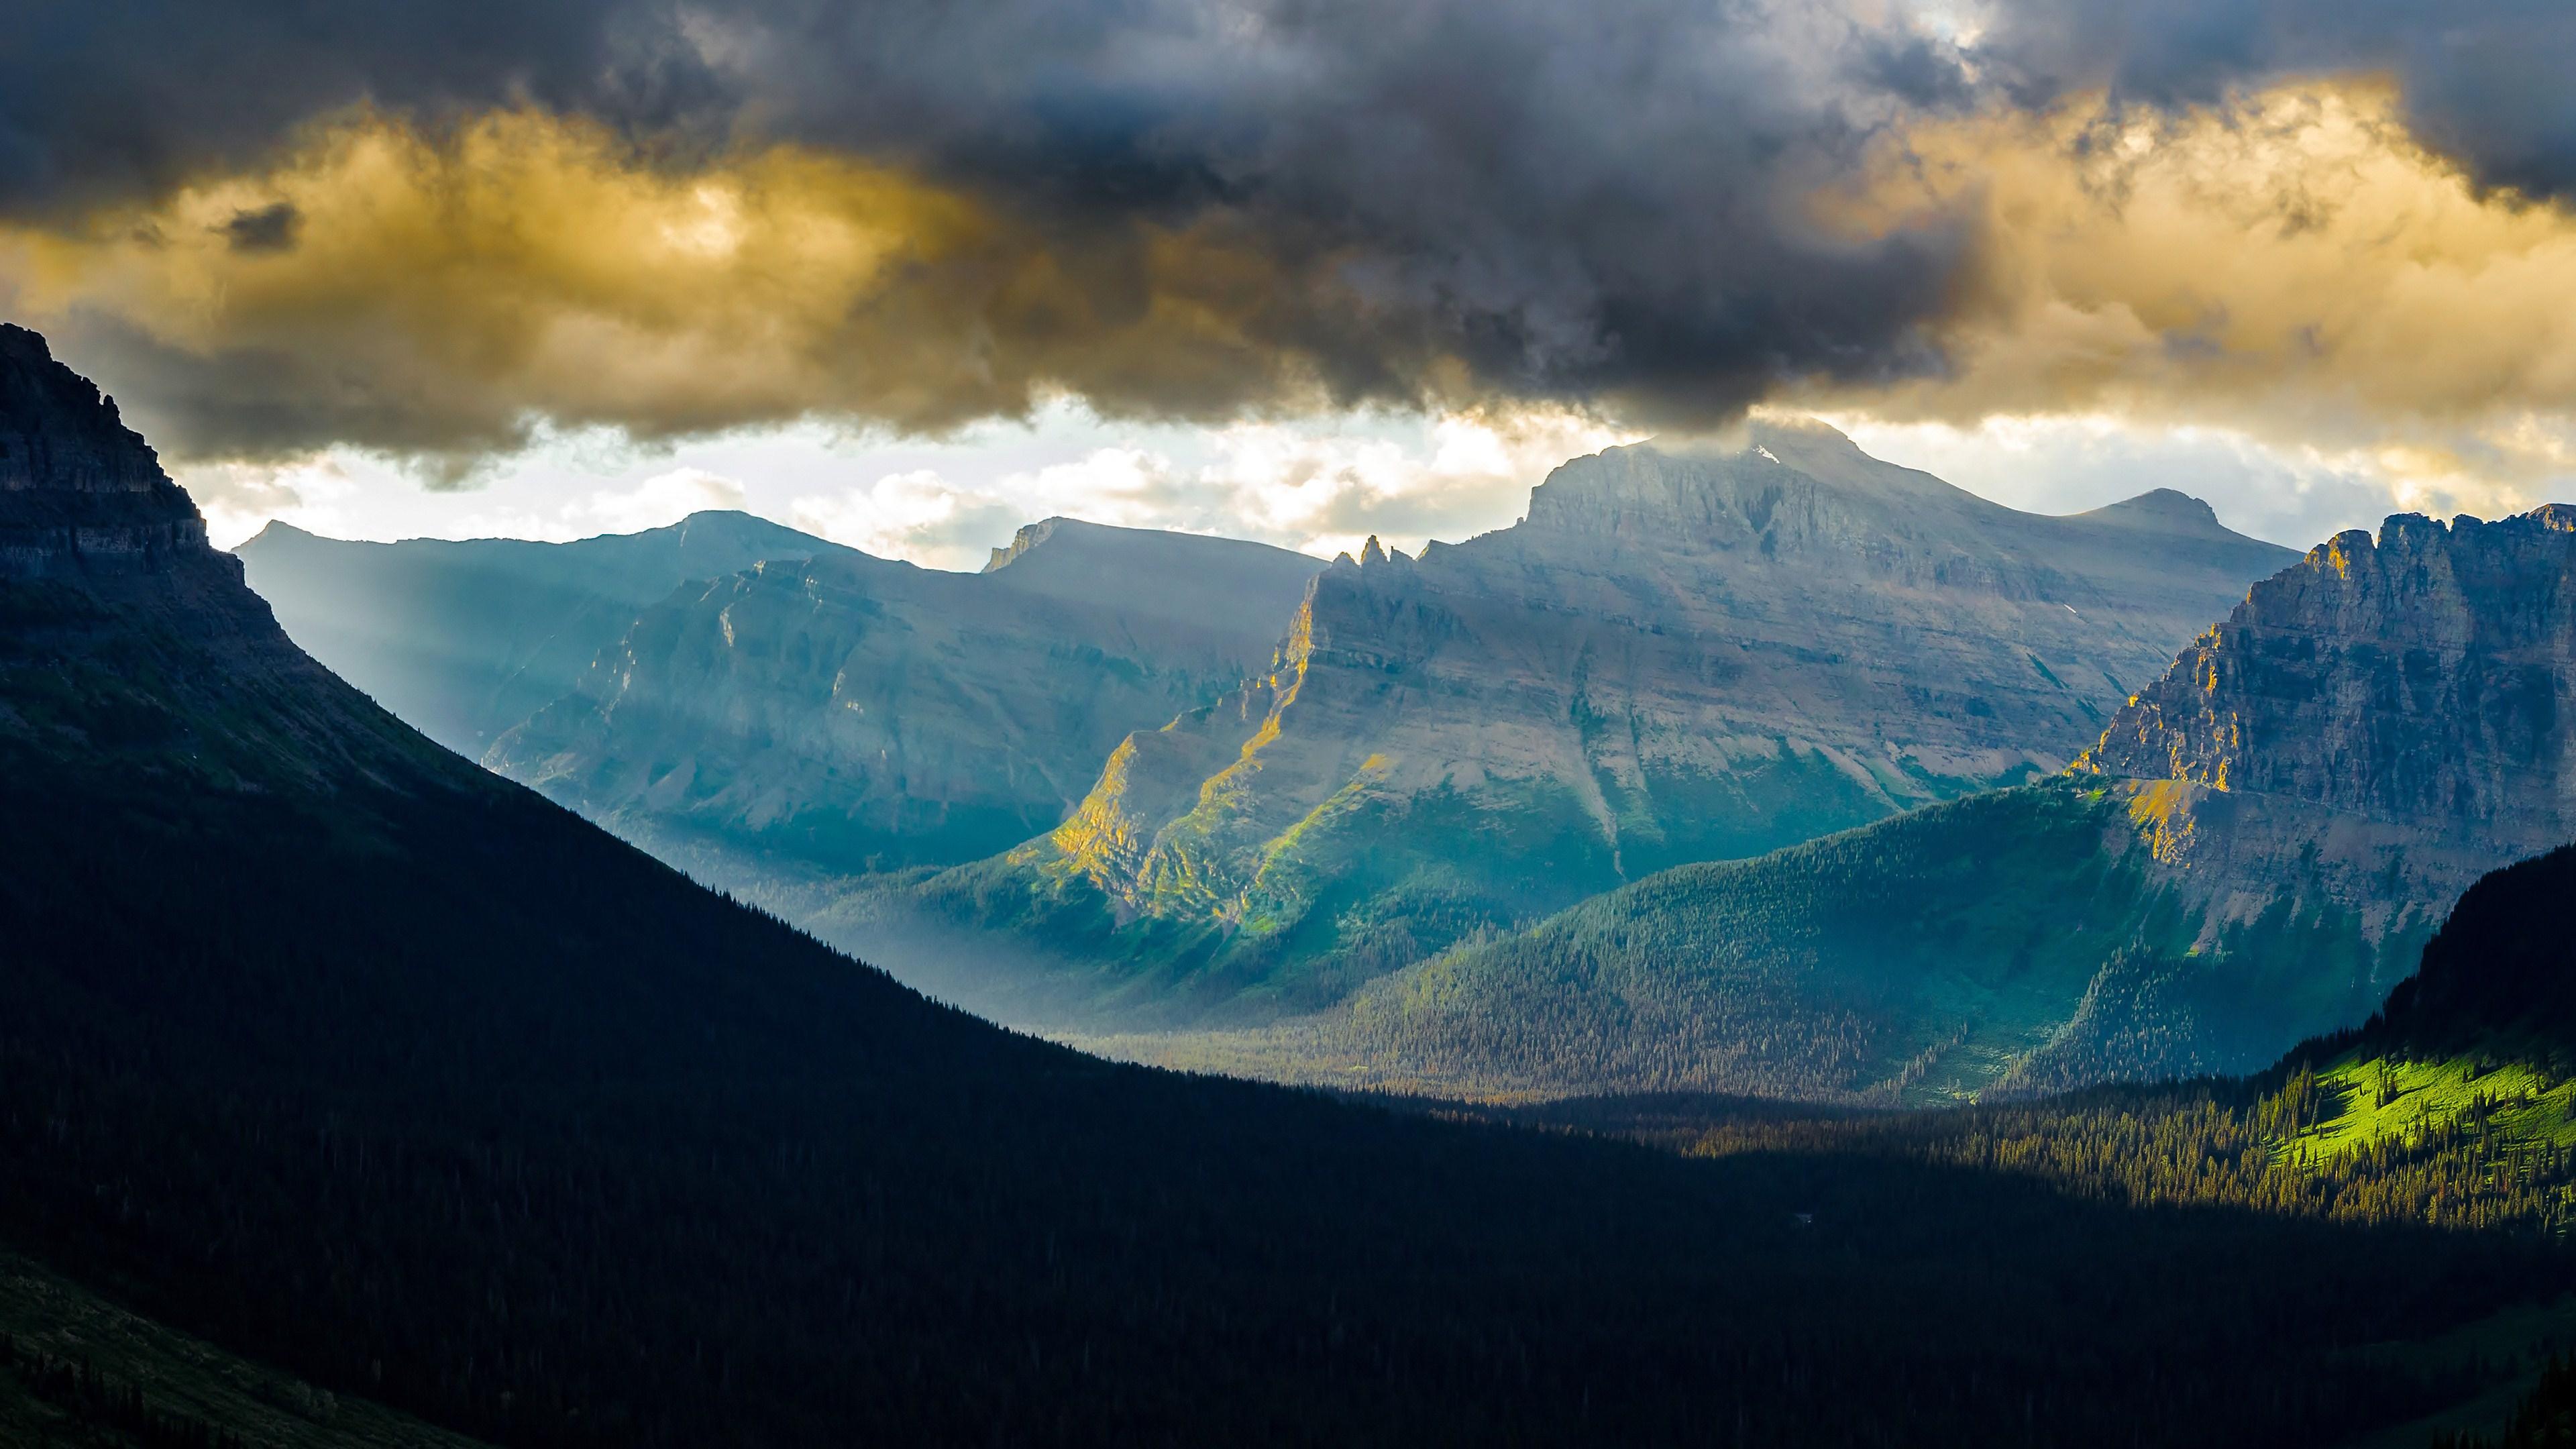 Mountain 4k Ultra HD Wallpaper | Background Image ...